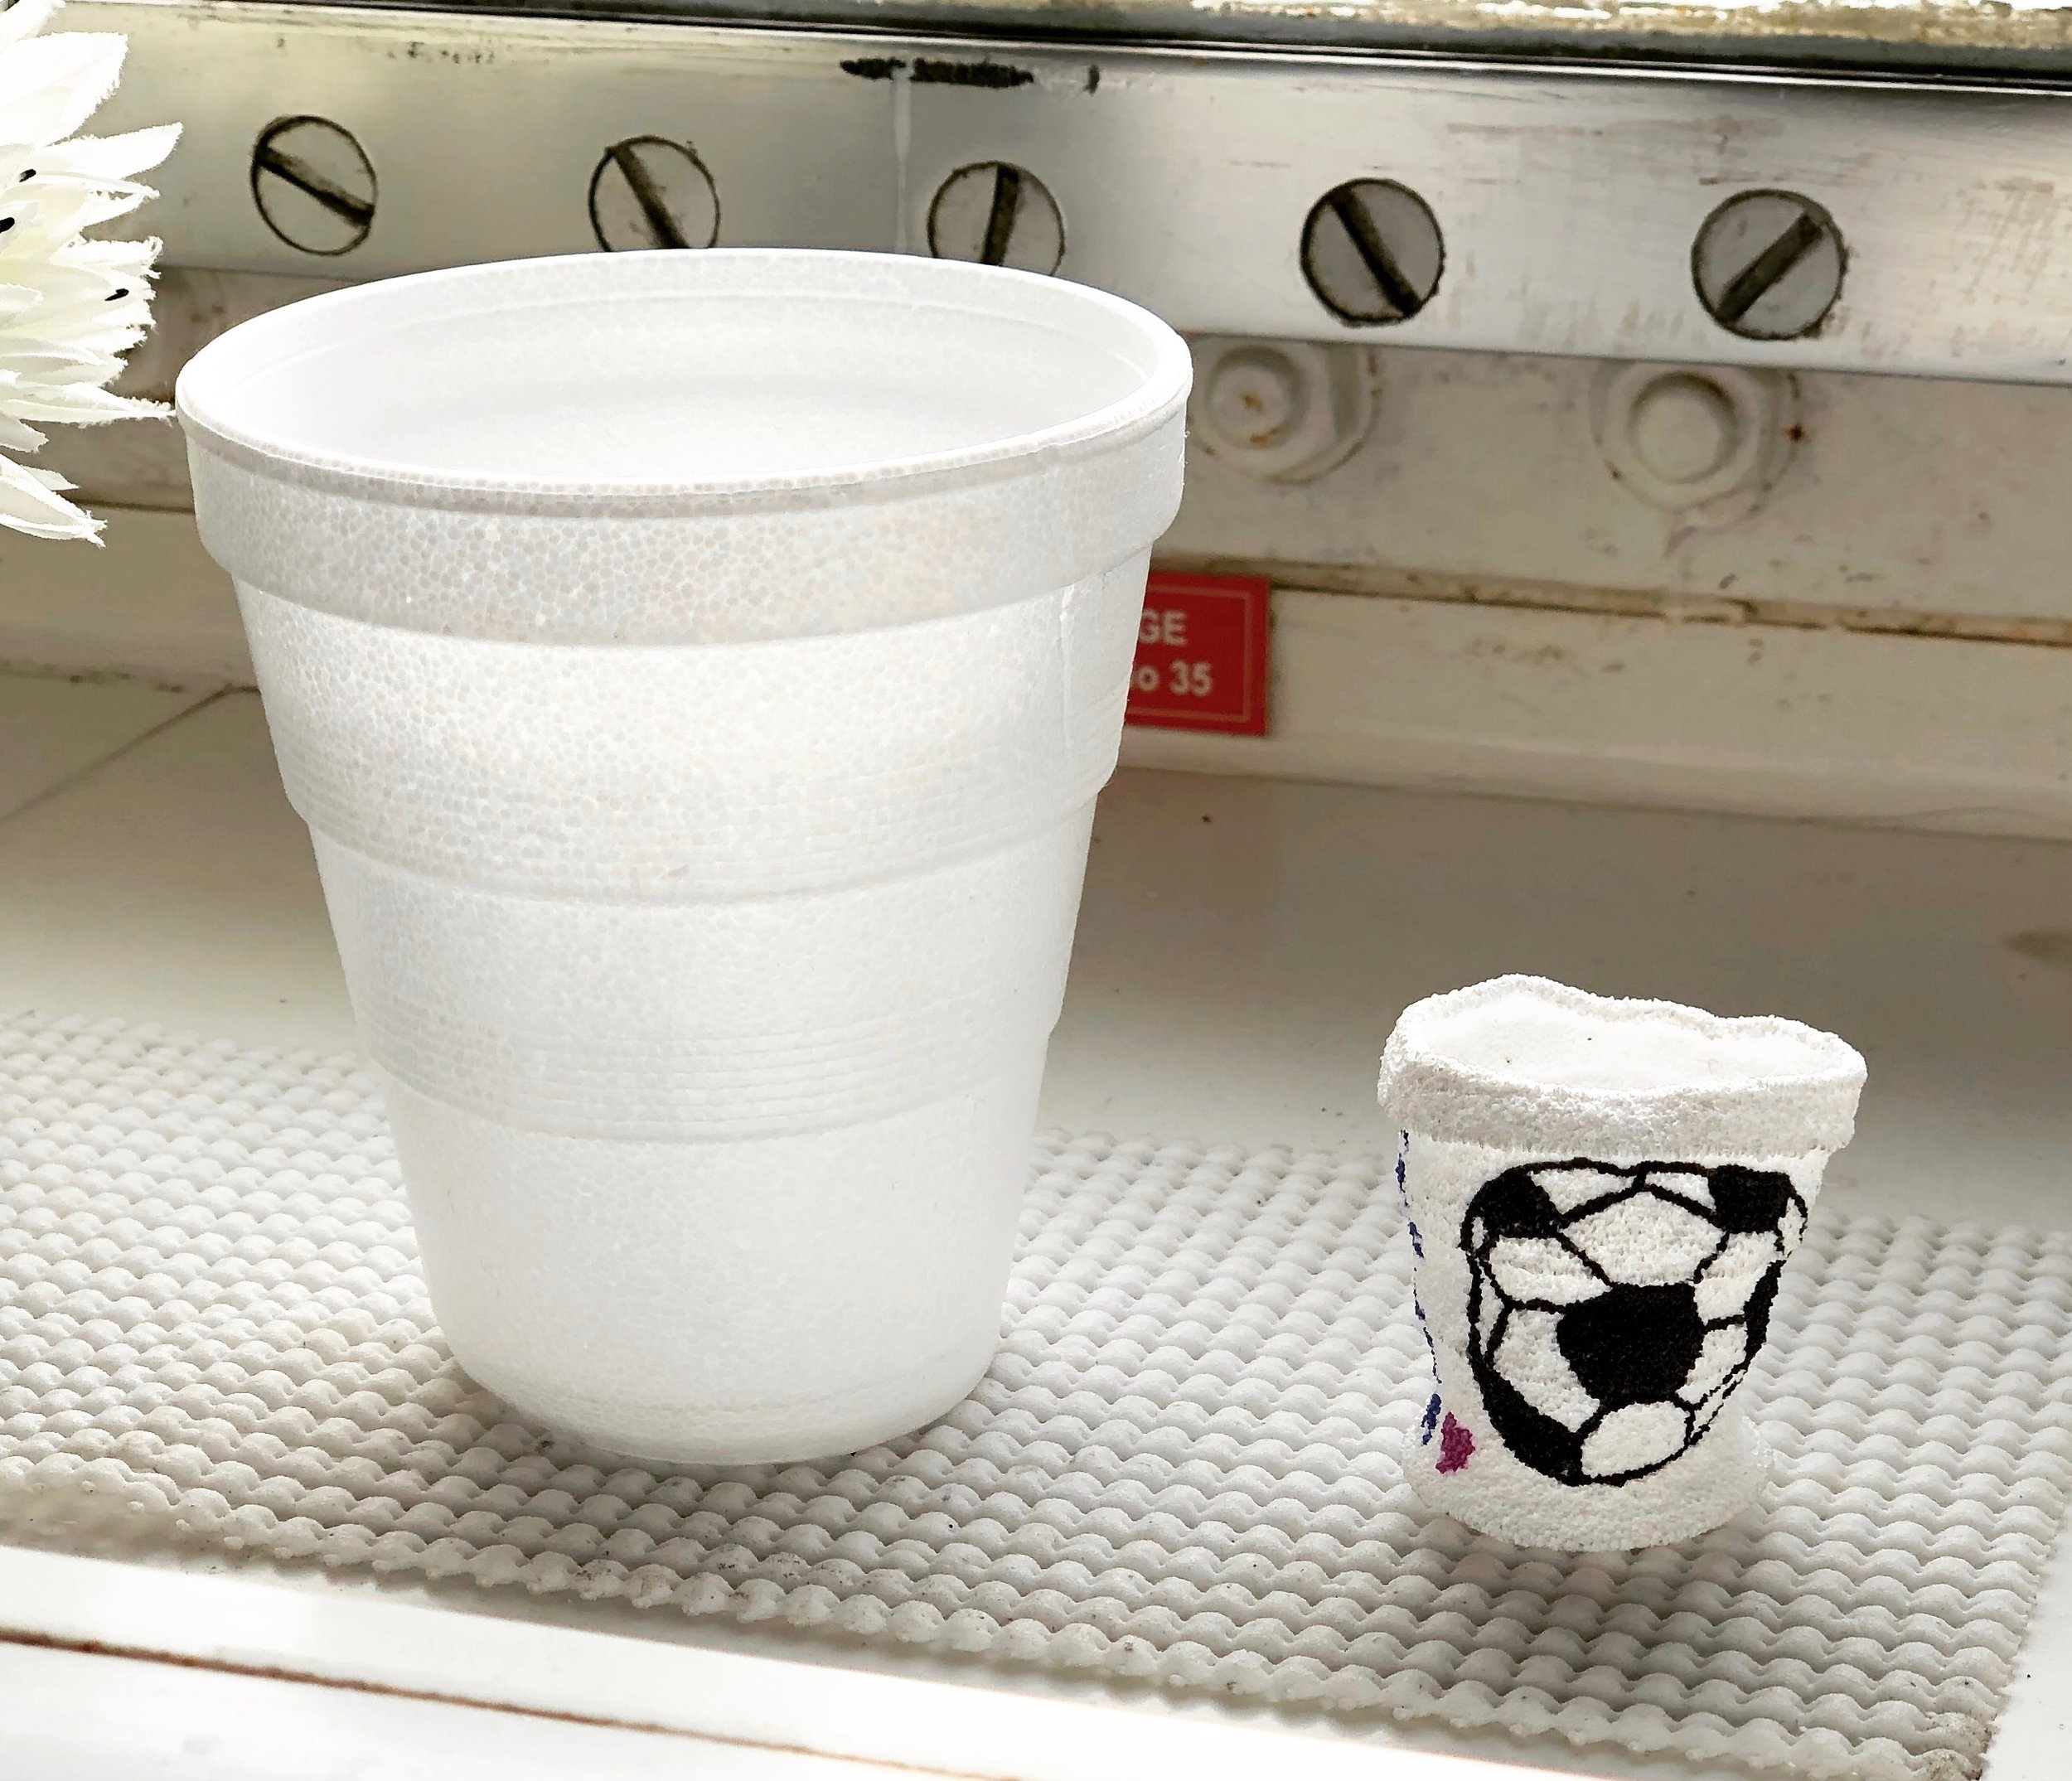 Honey, I shrank this cup!